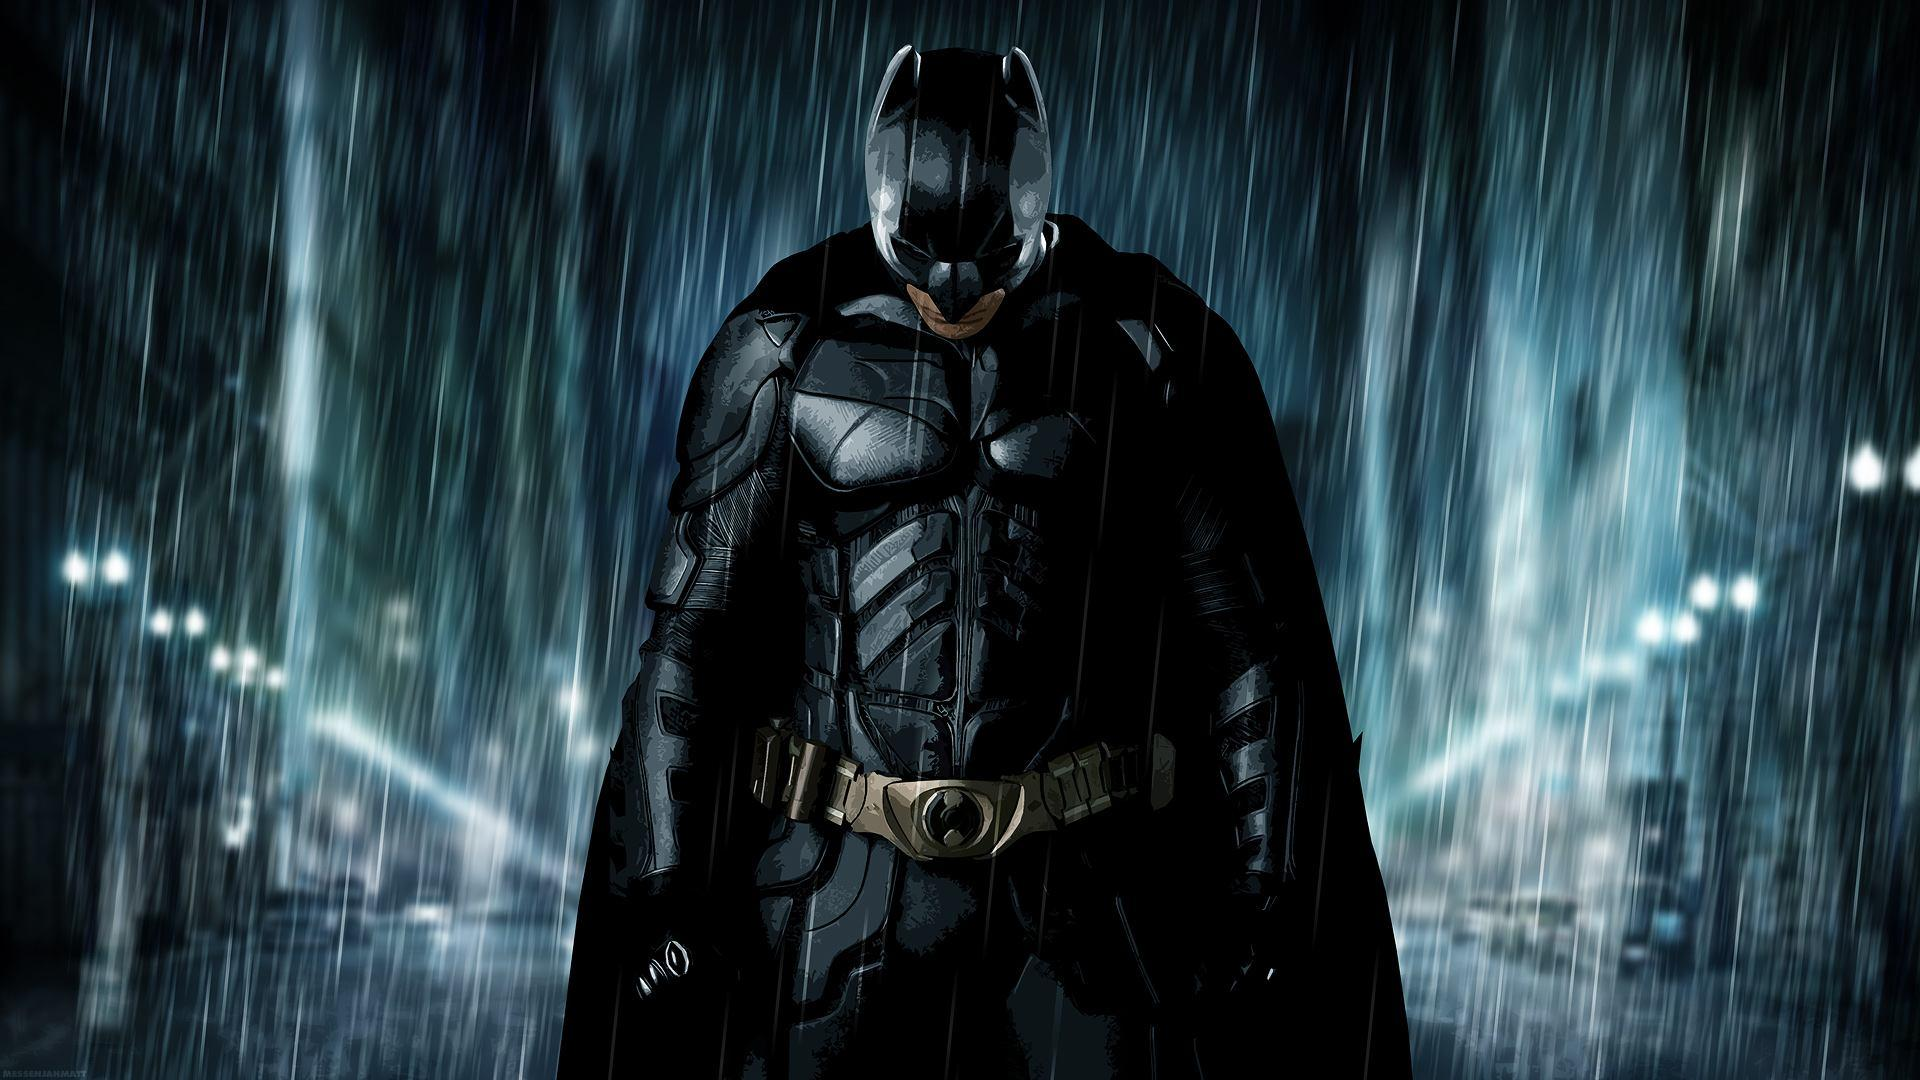 Batman - HD Movie Wallpapers - Free Download